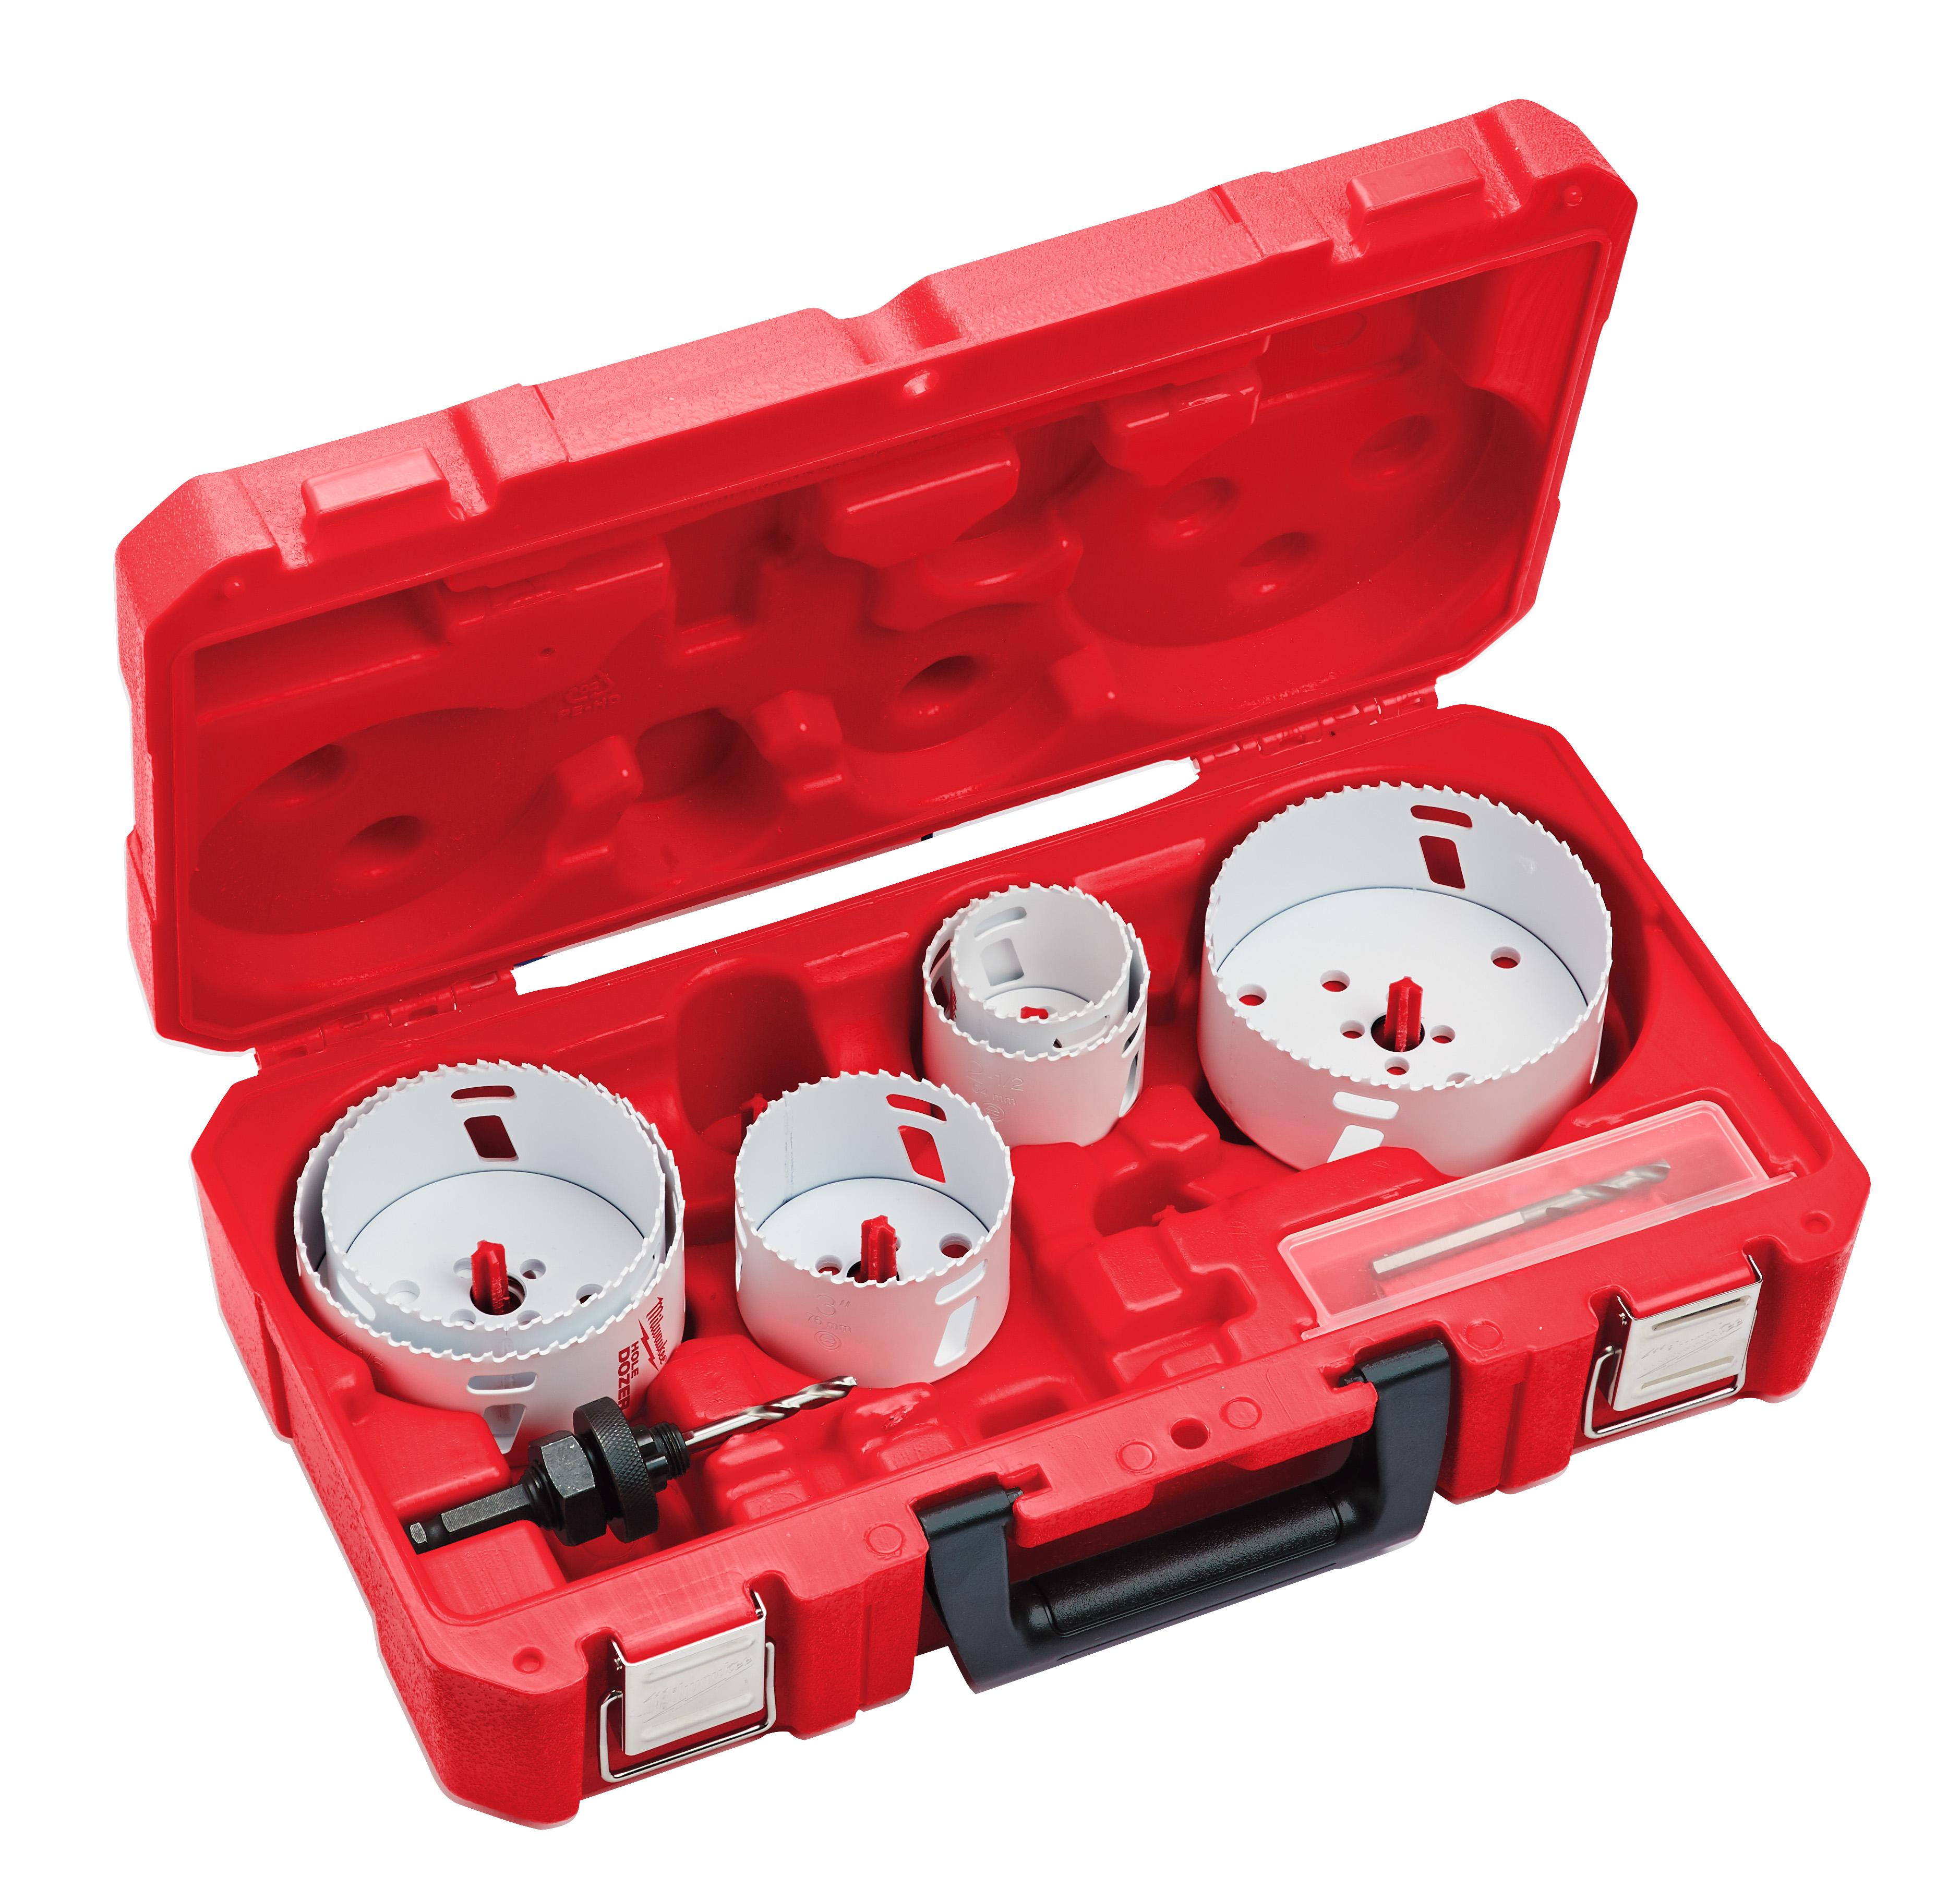 Milwaukee 49-22-4092 8pc Electrician's Large Diameter HOLE DOZER™ Hole Saw Kit